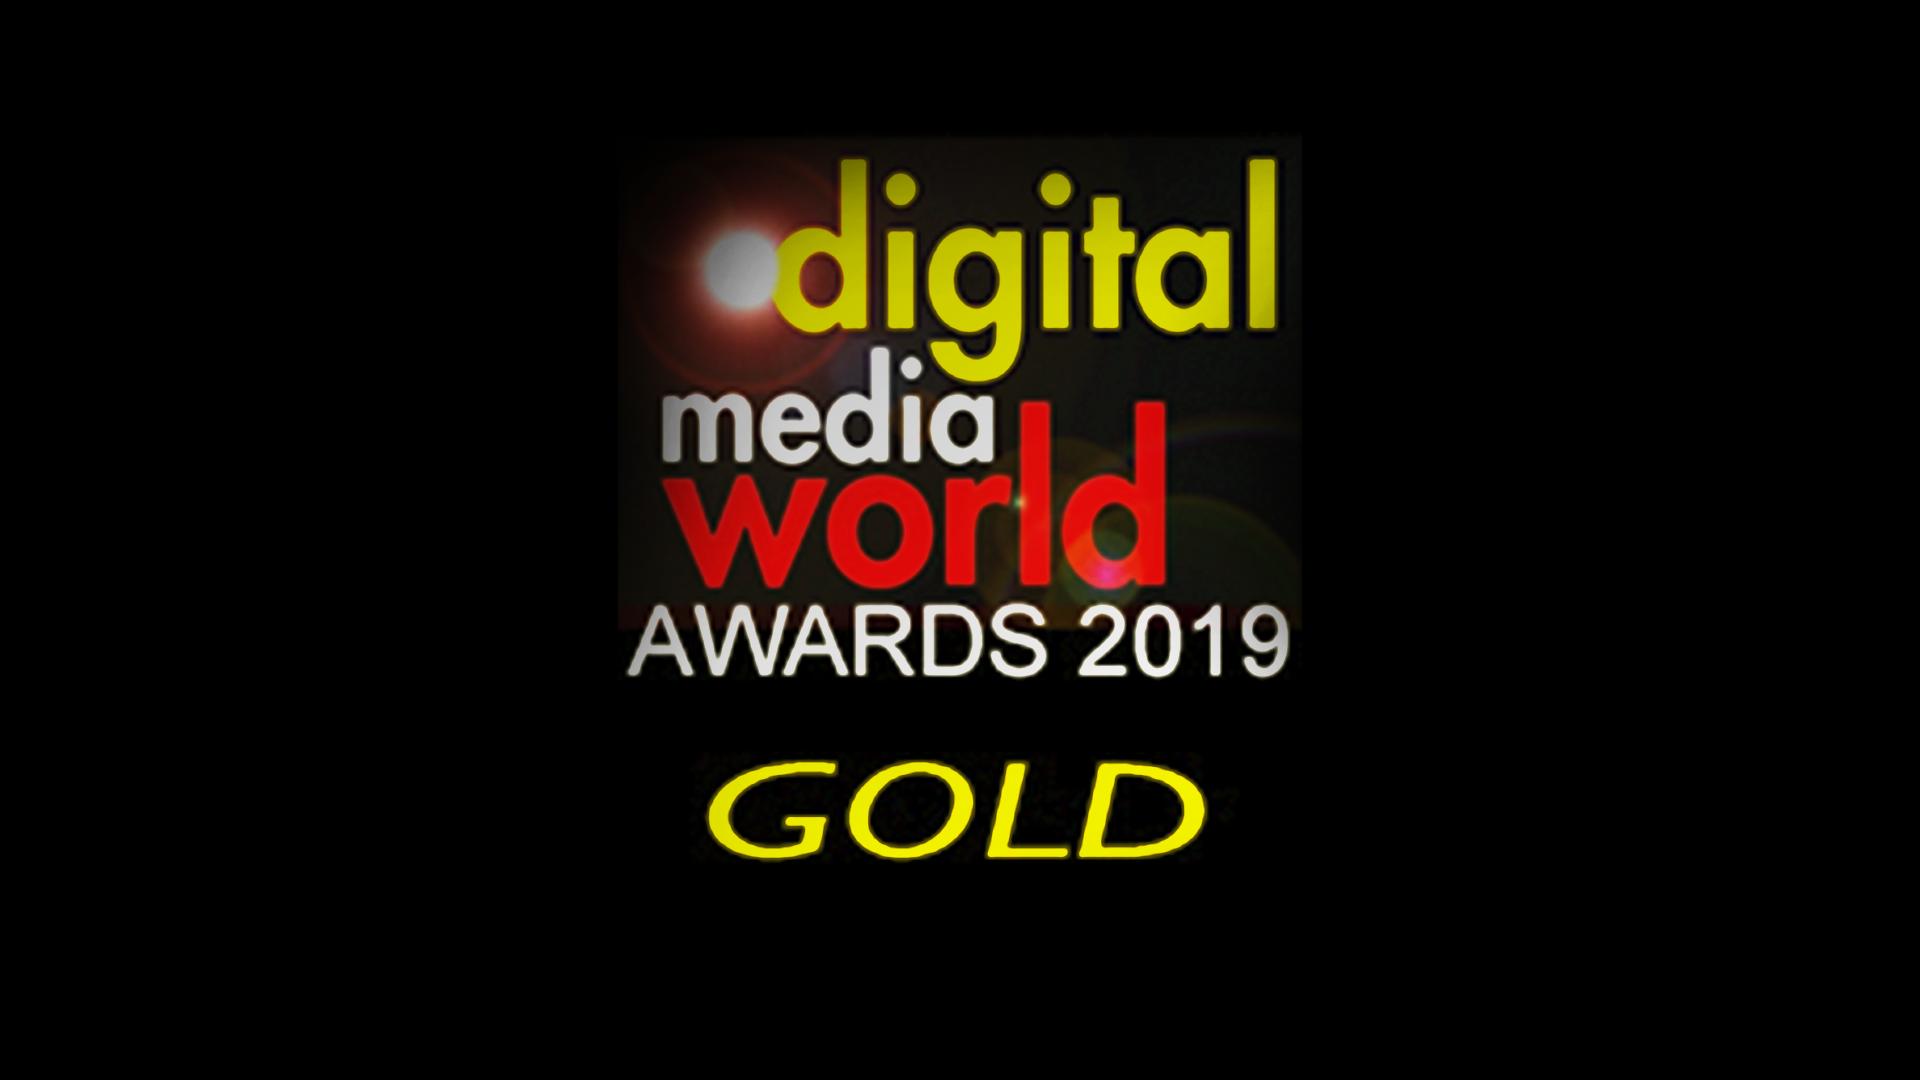 Singular wins 2019 Digital Media World Award for Broadcast - Motion Graphics